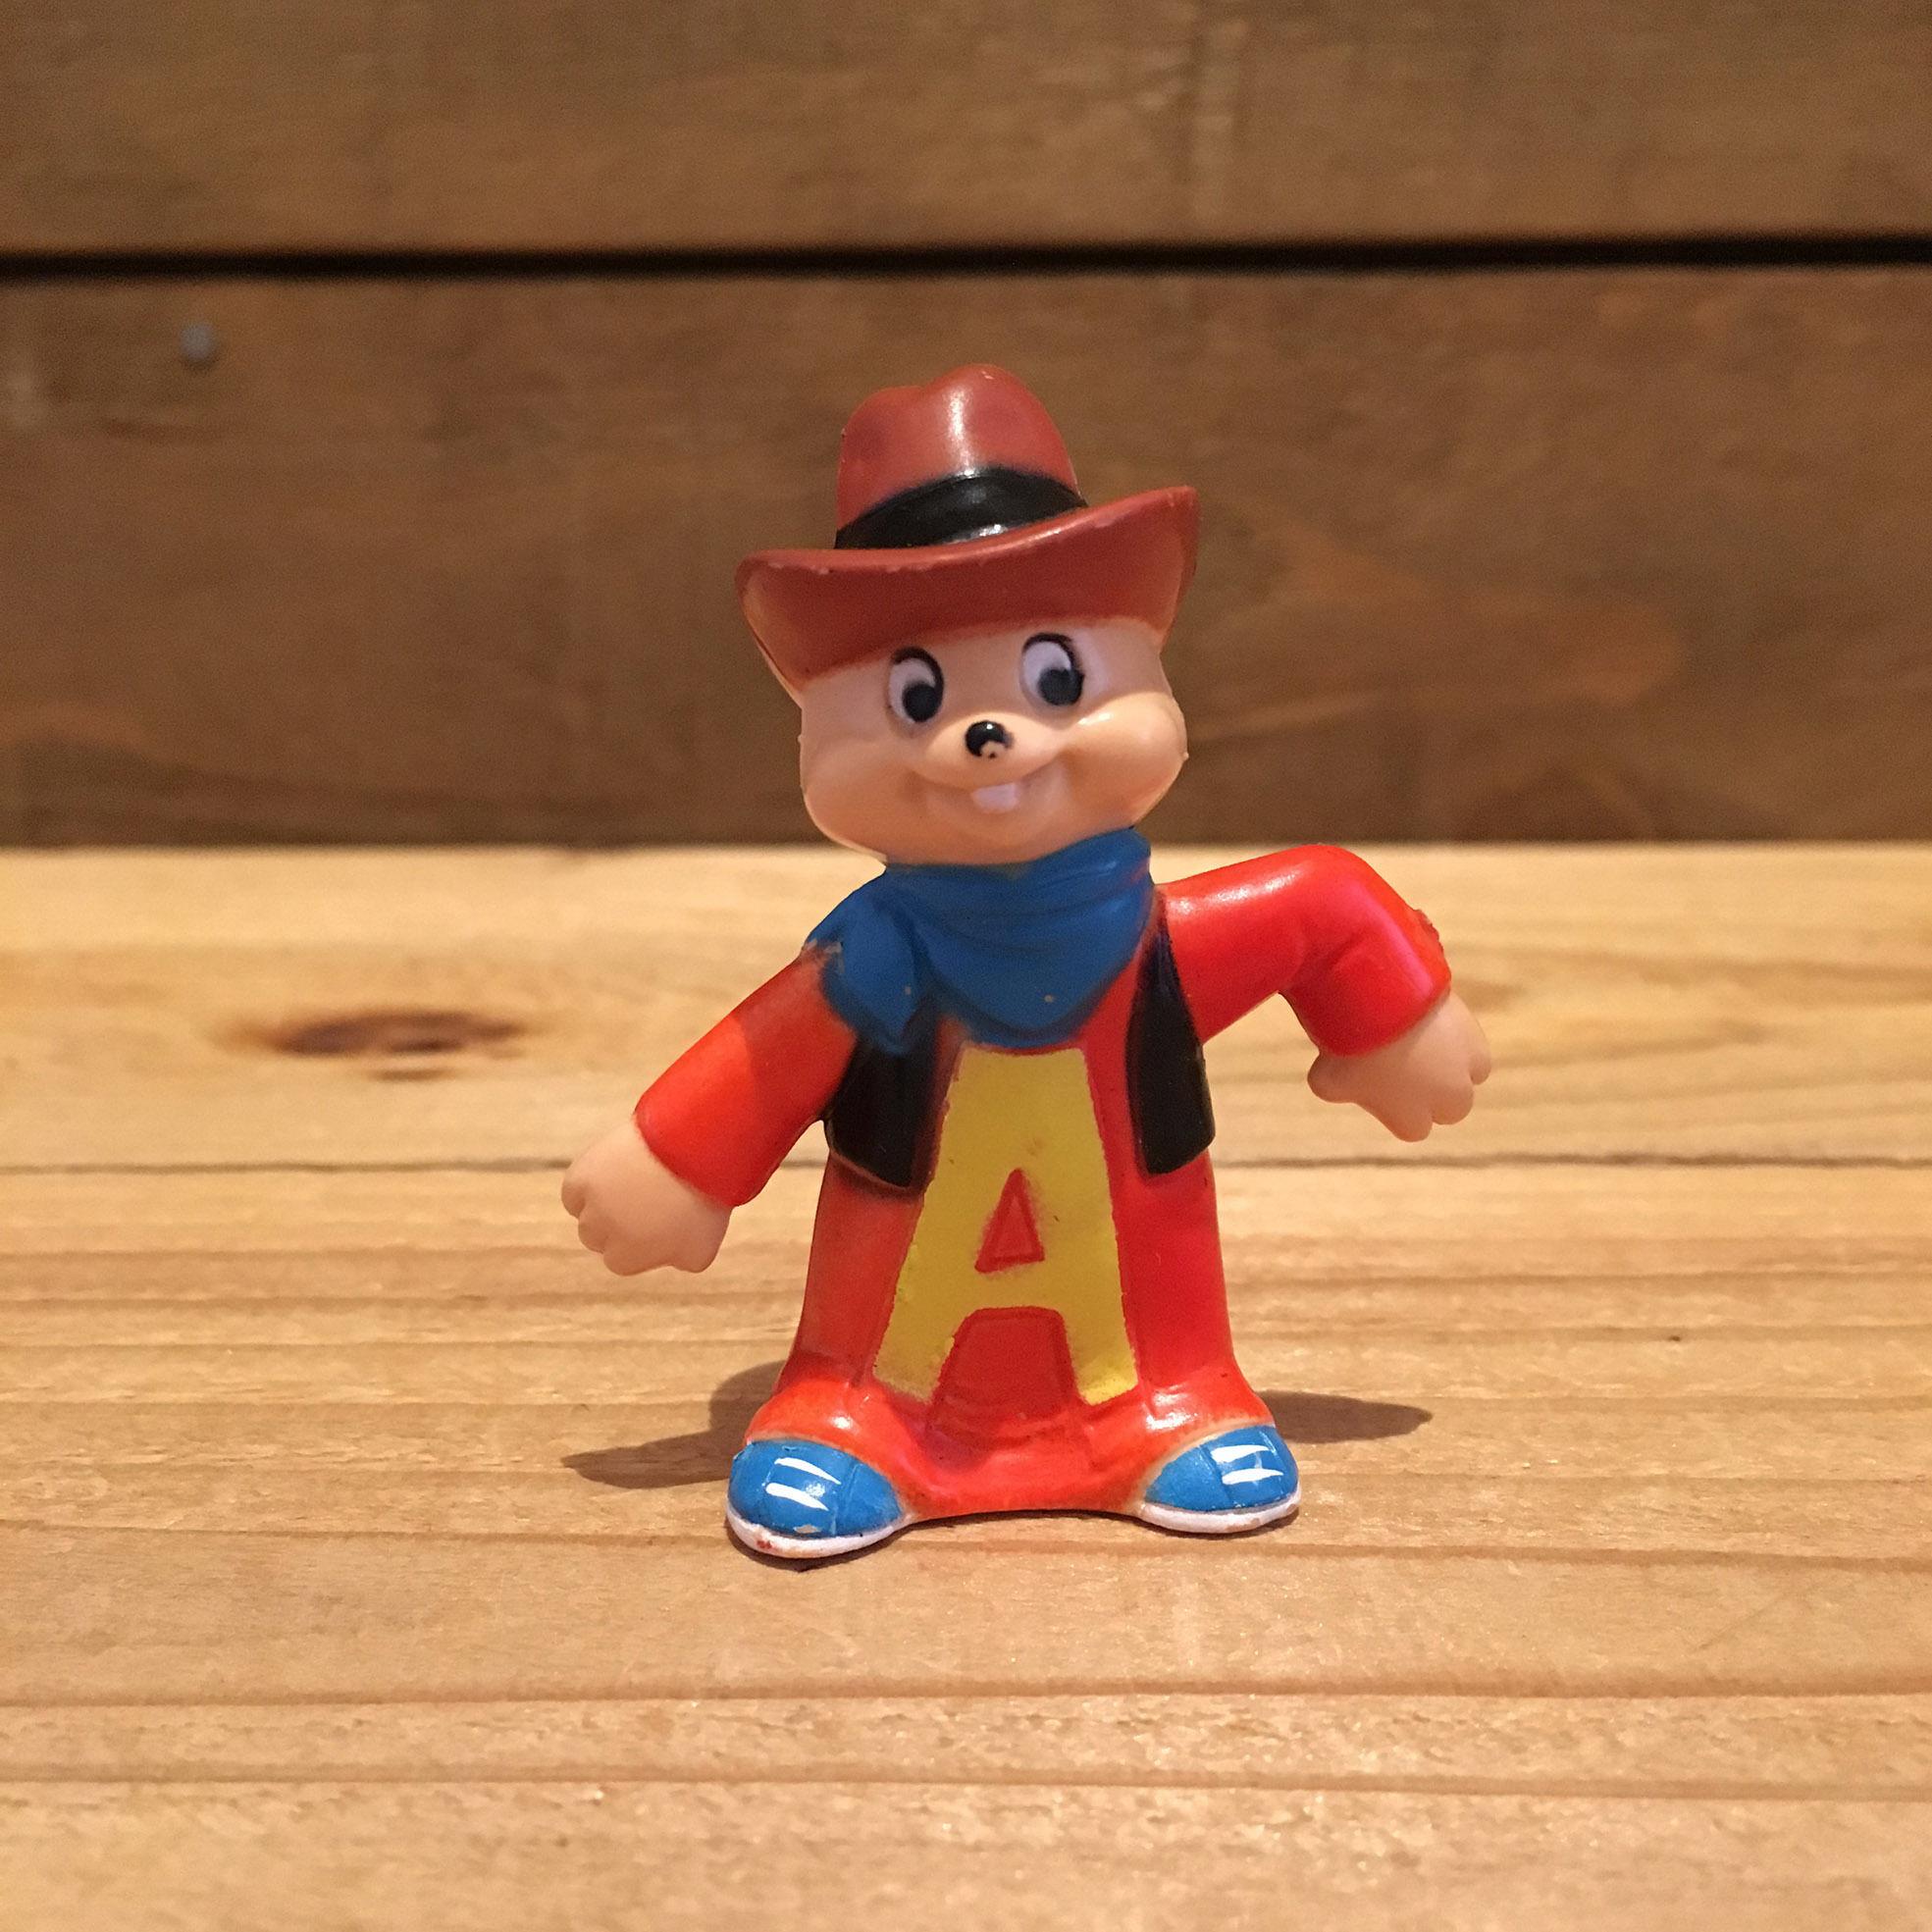 Alvin and the Chipmunks Alvin PVC FIgure/アルビンとチップマンクス アルビン PVCフィギュア/1806014-7